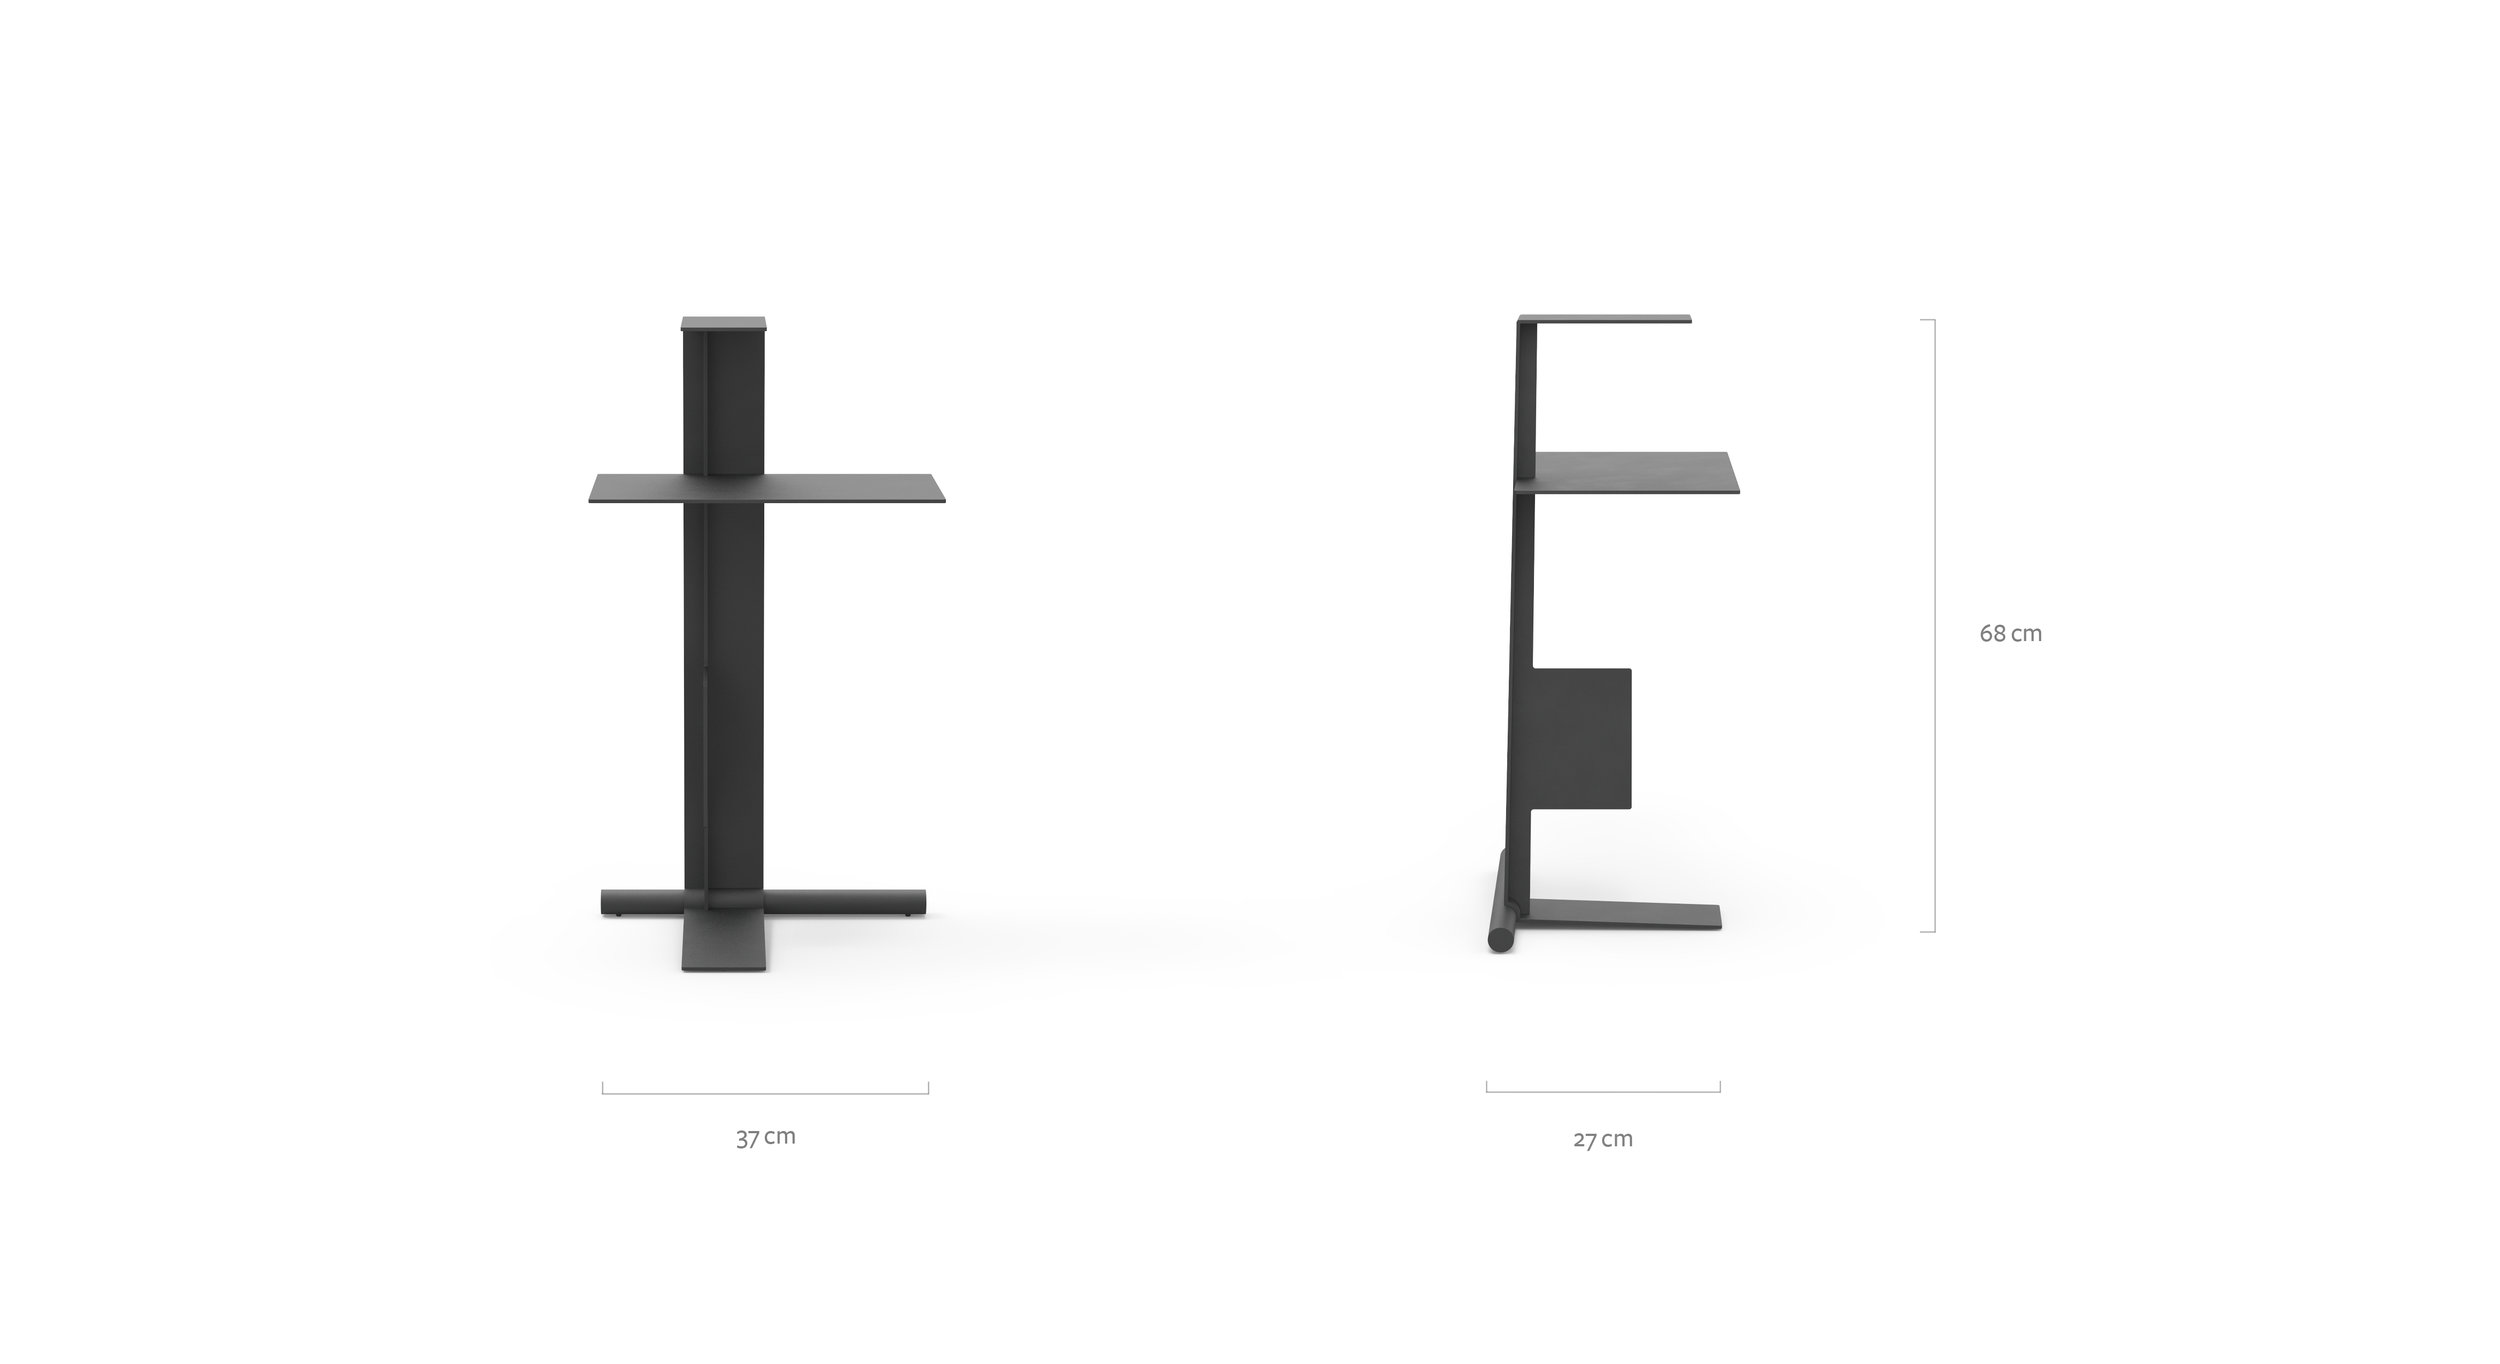 Studio-Pascal-Howe_Size_No19.jpg